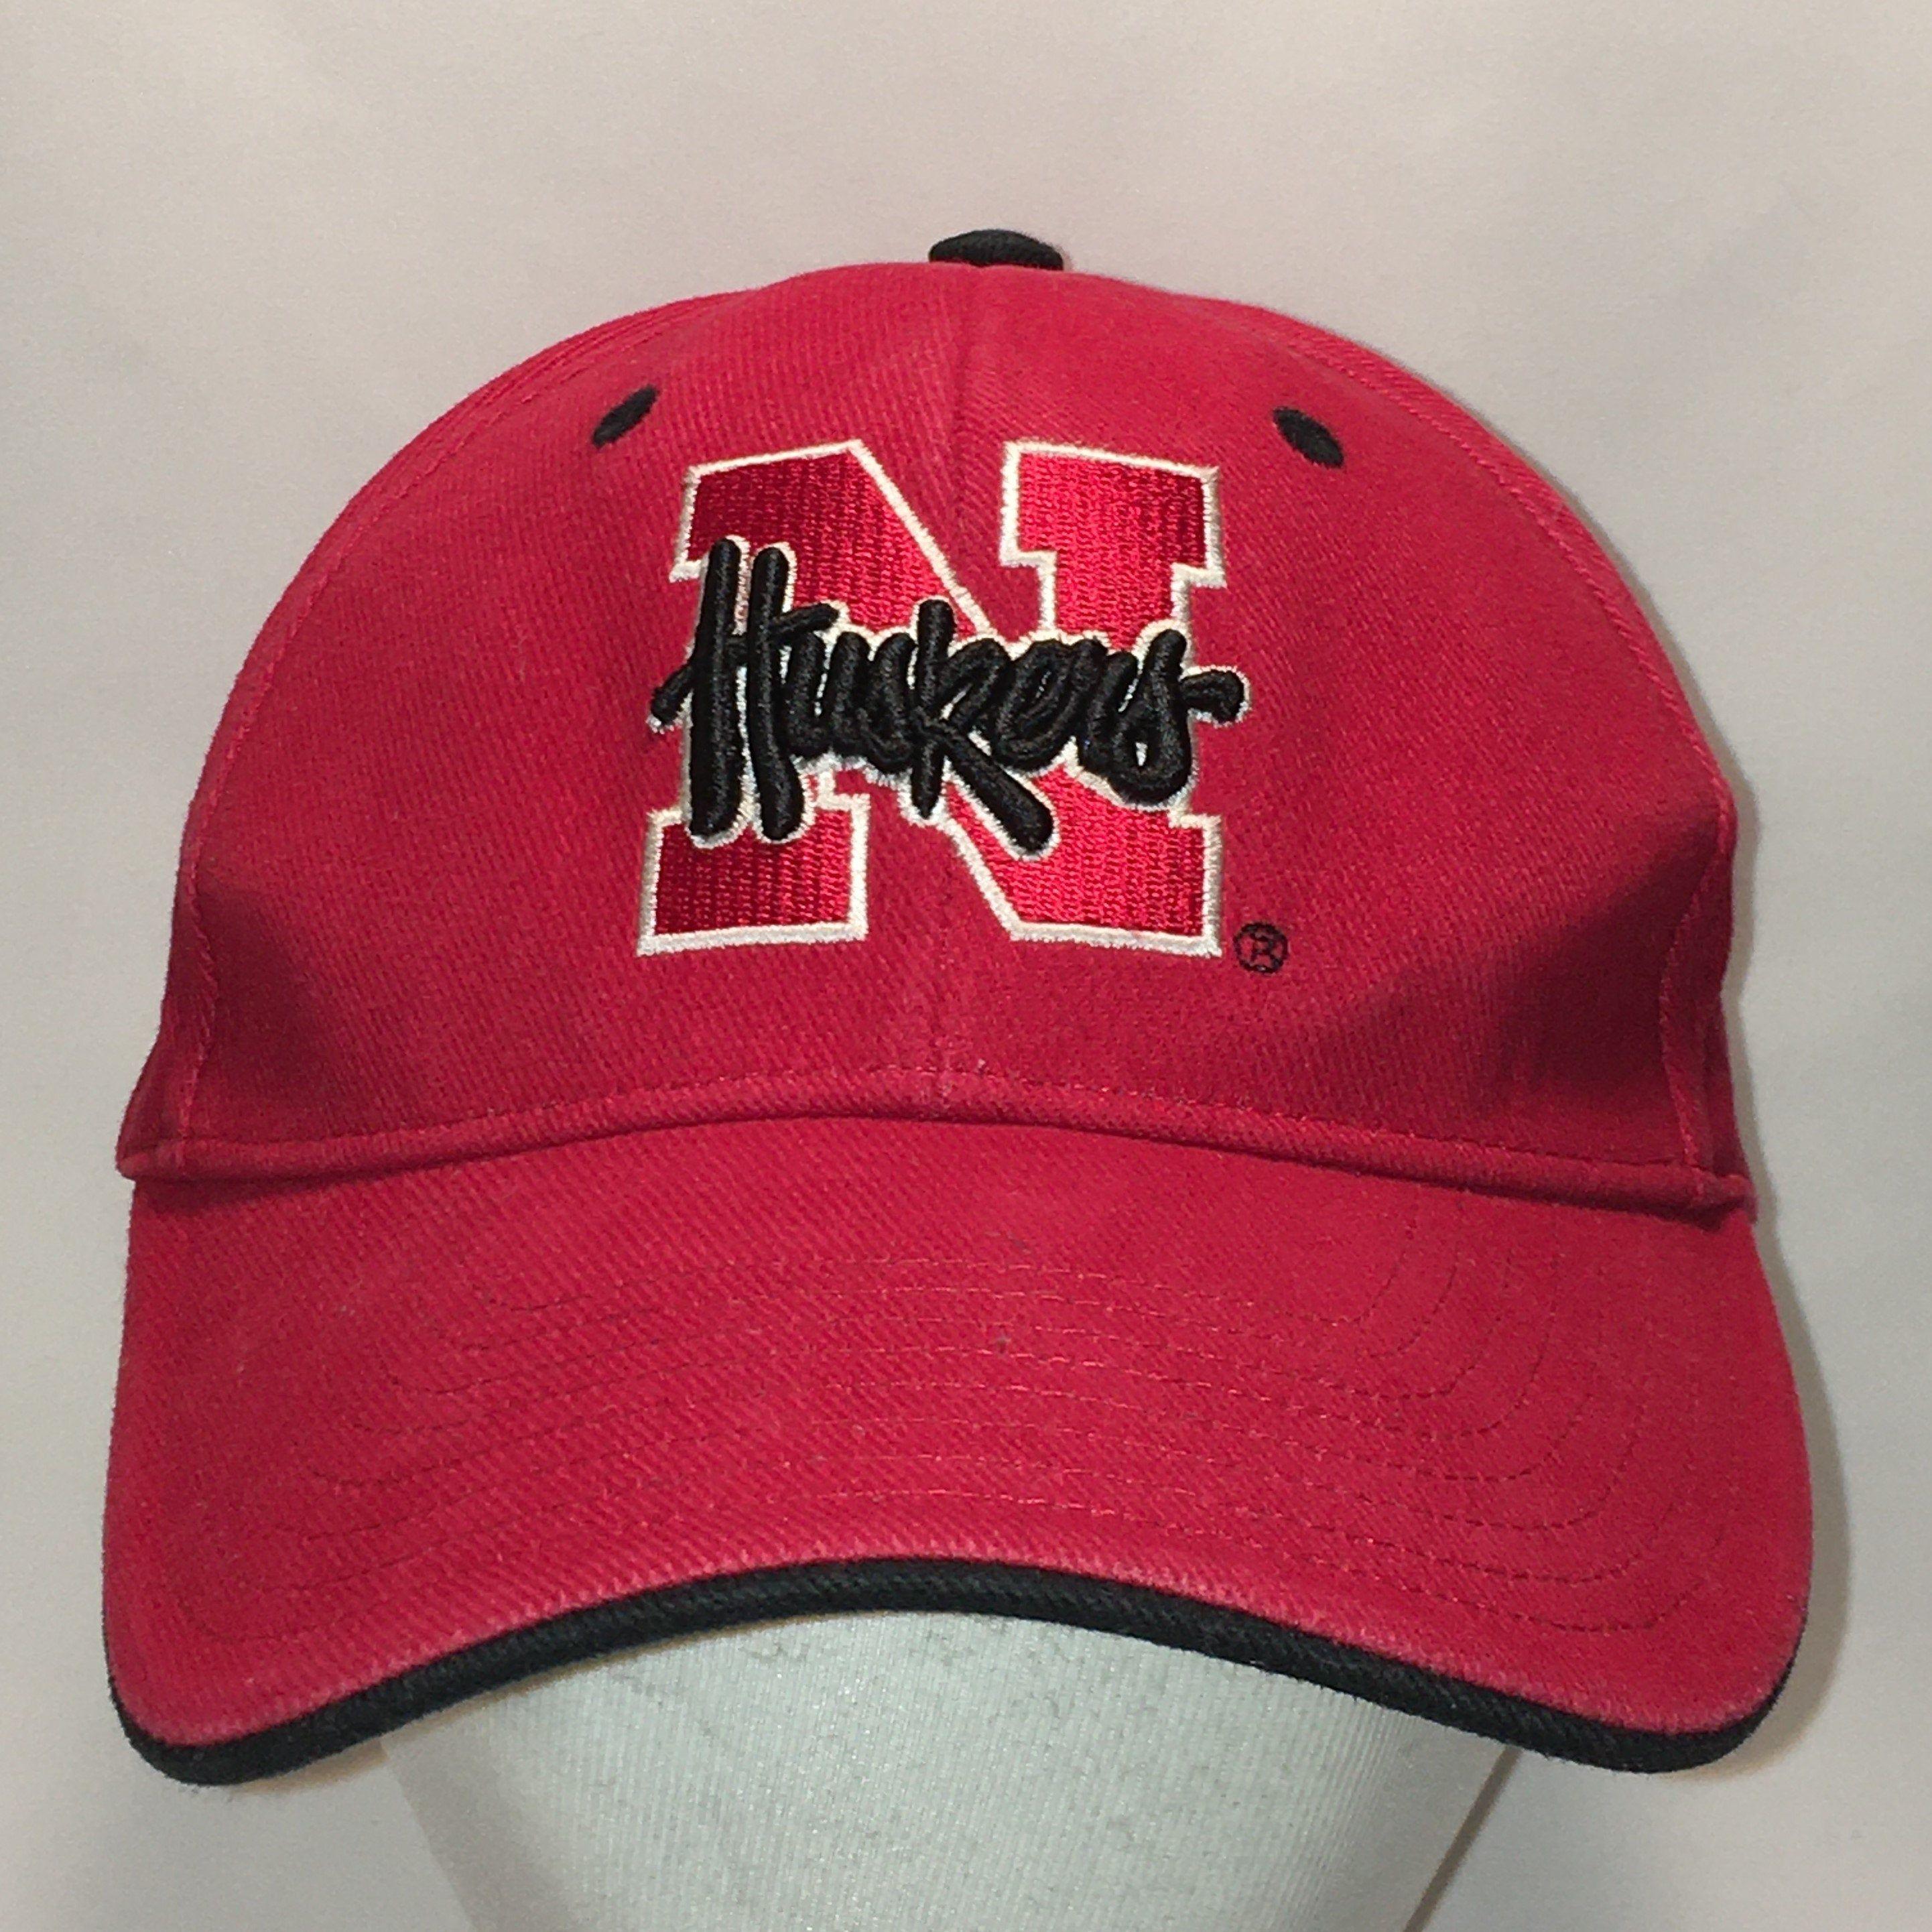 Vintage University Of Nebraska Hat Cornhuskers Baseball Cap Etsy Vintage Baseball Caps Dad Hats Cornhuskers